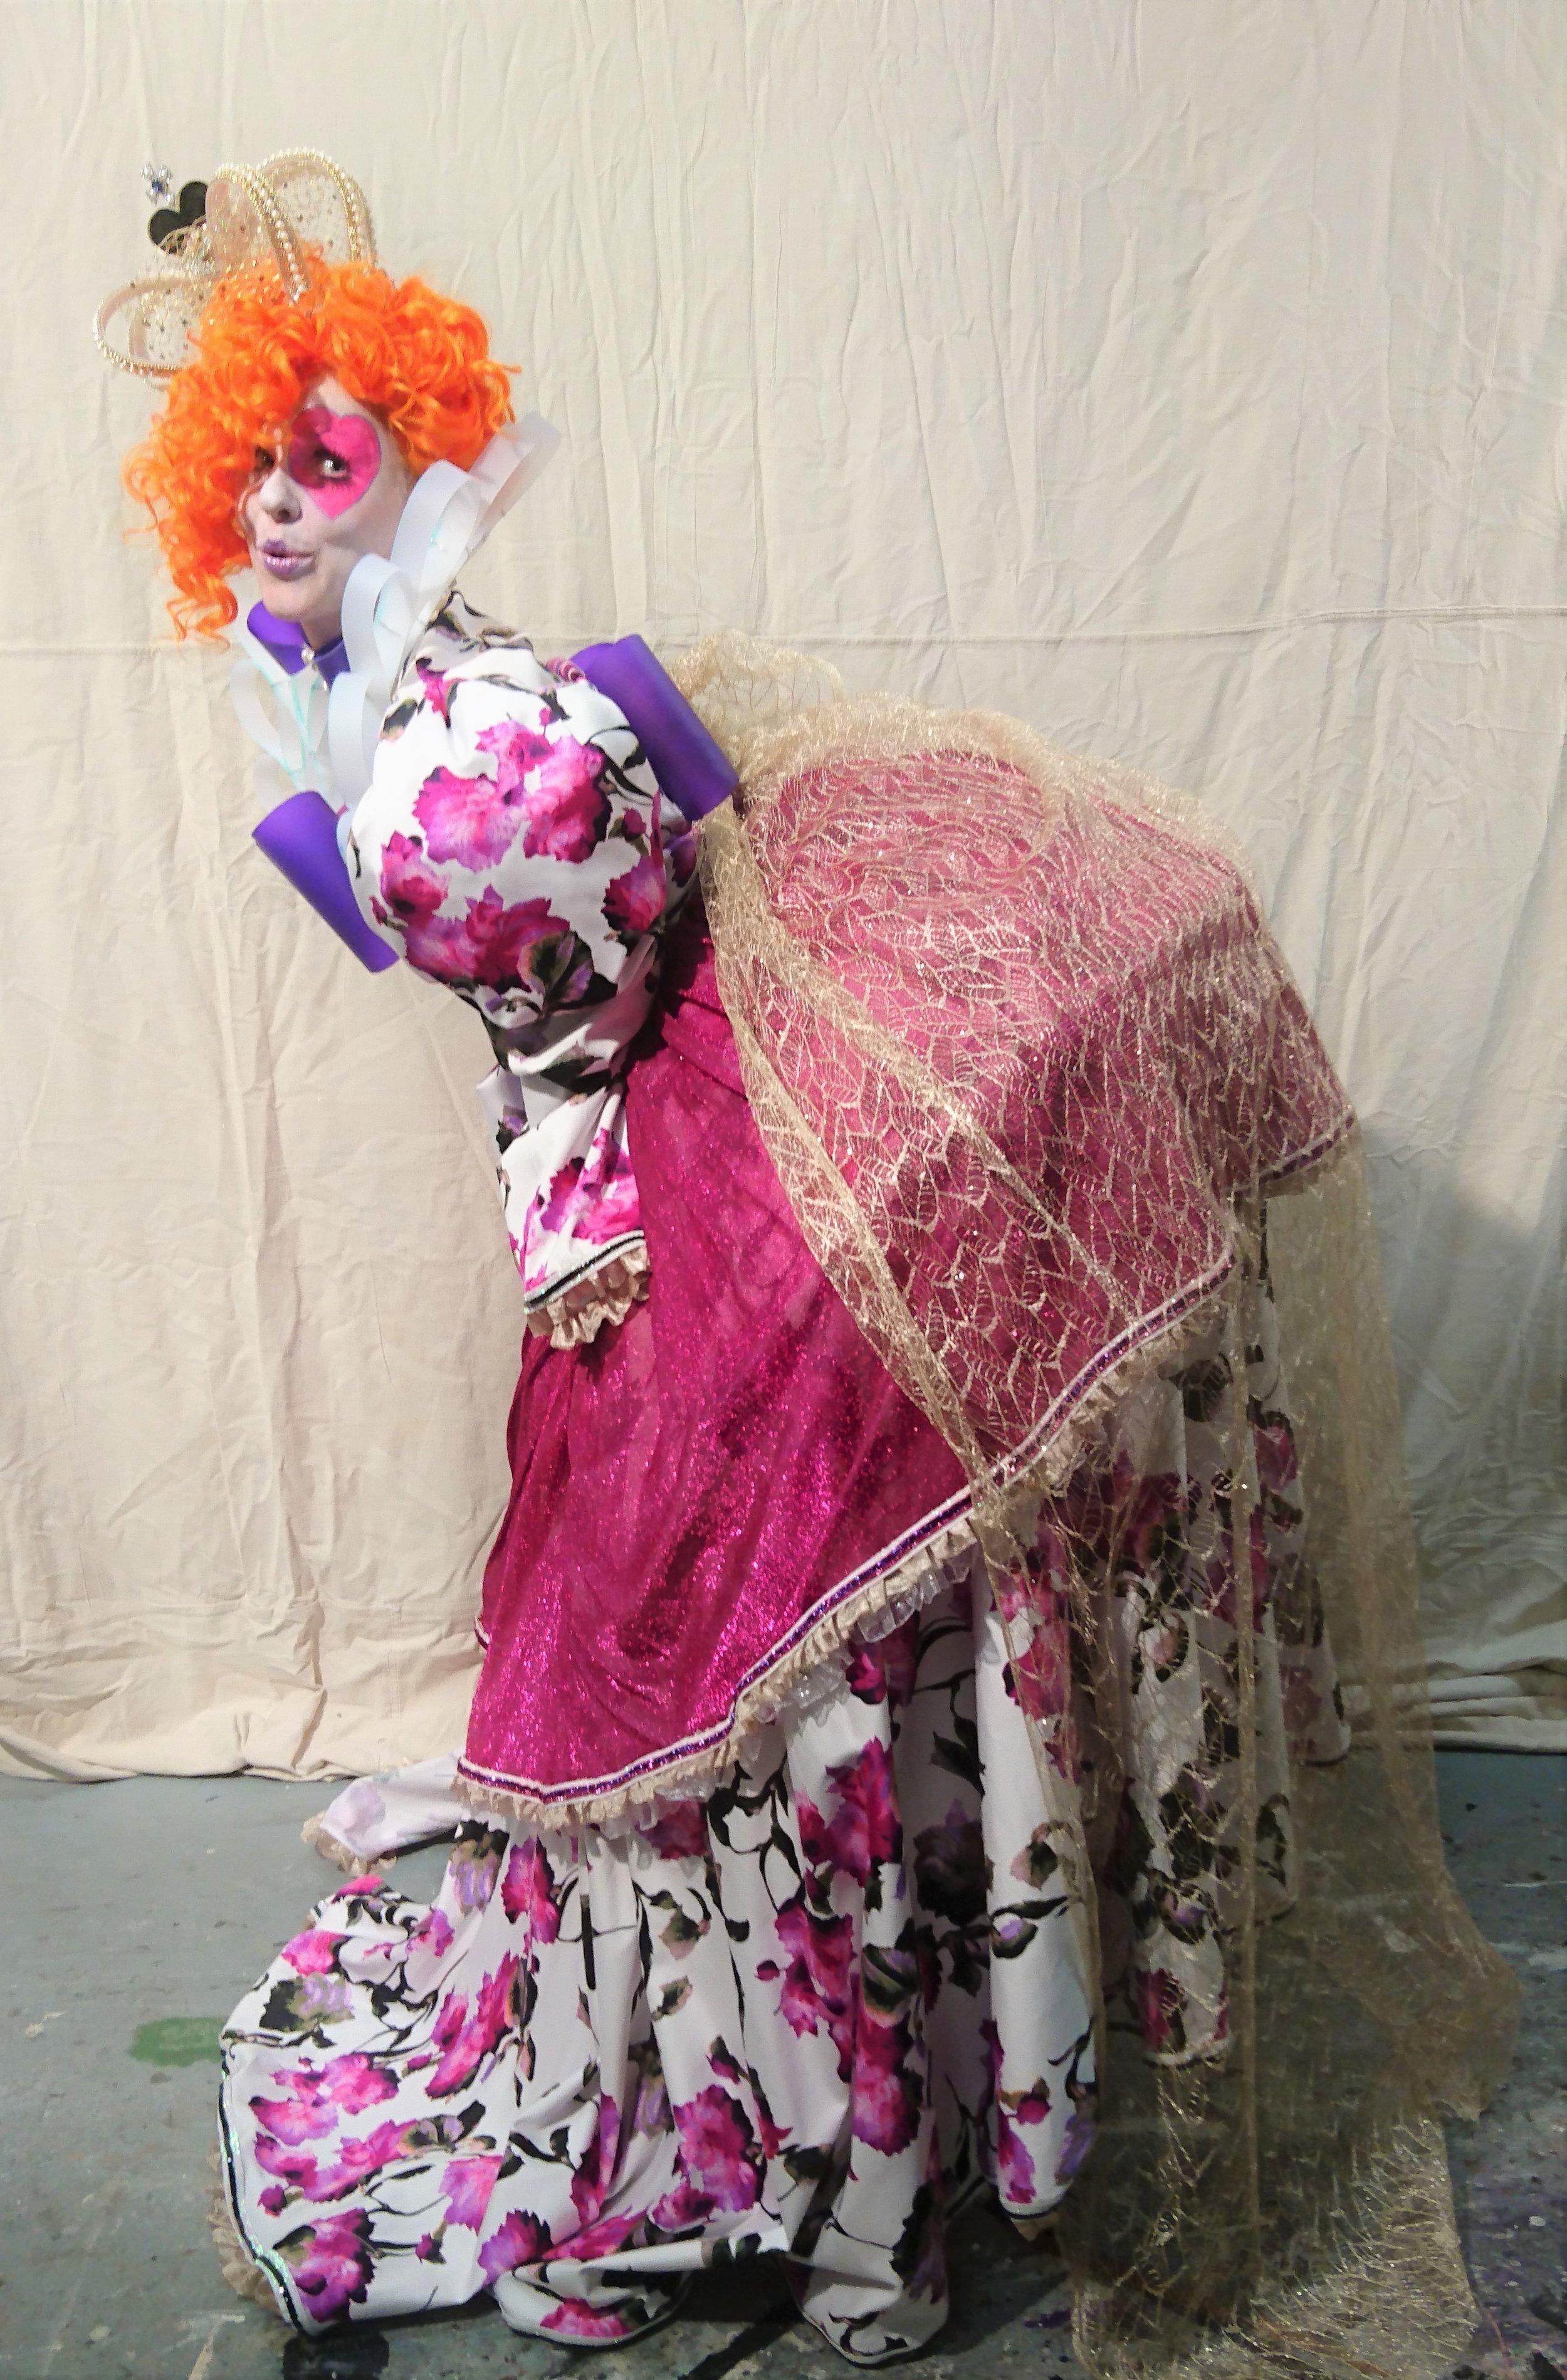 The Human Chameleon - Queen Elizabeth Costume - New Romantic by Kristine Walker (5).jpg